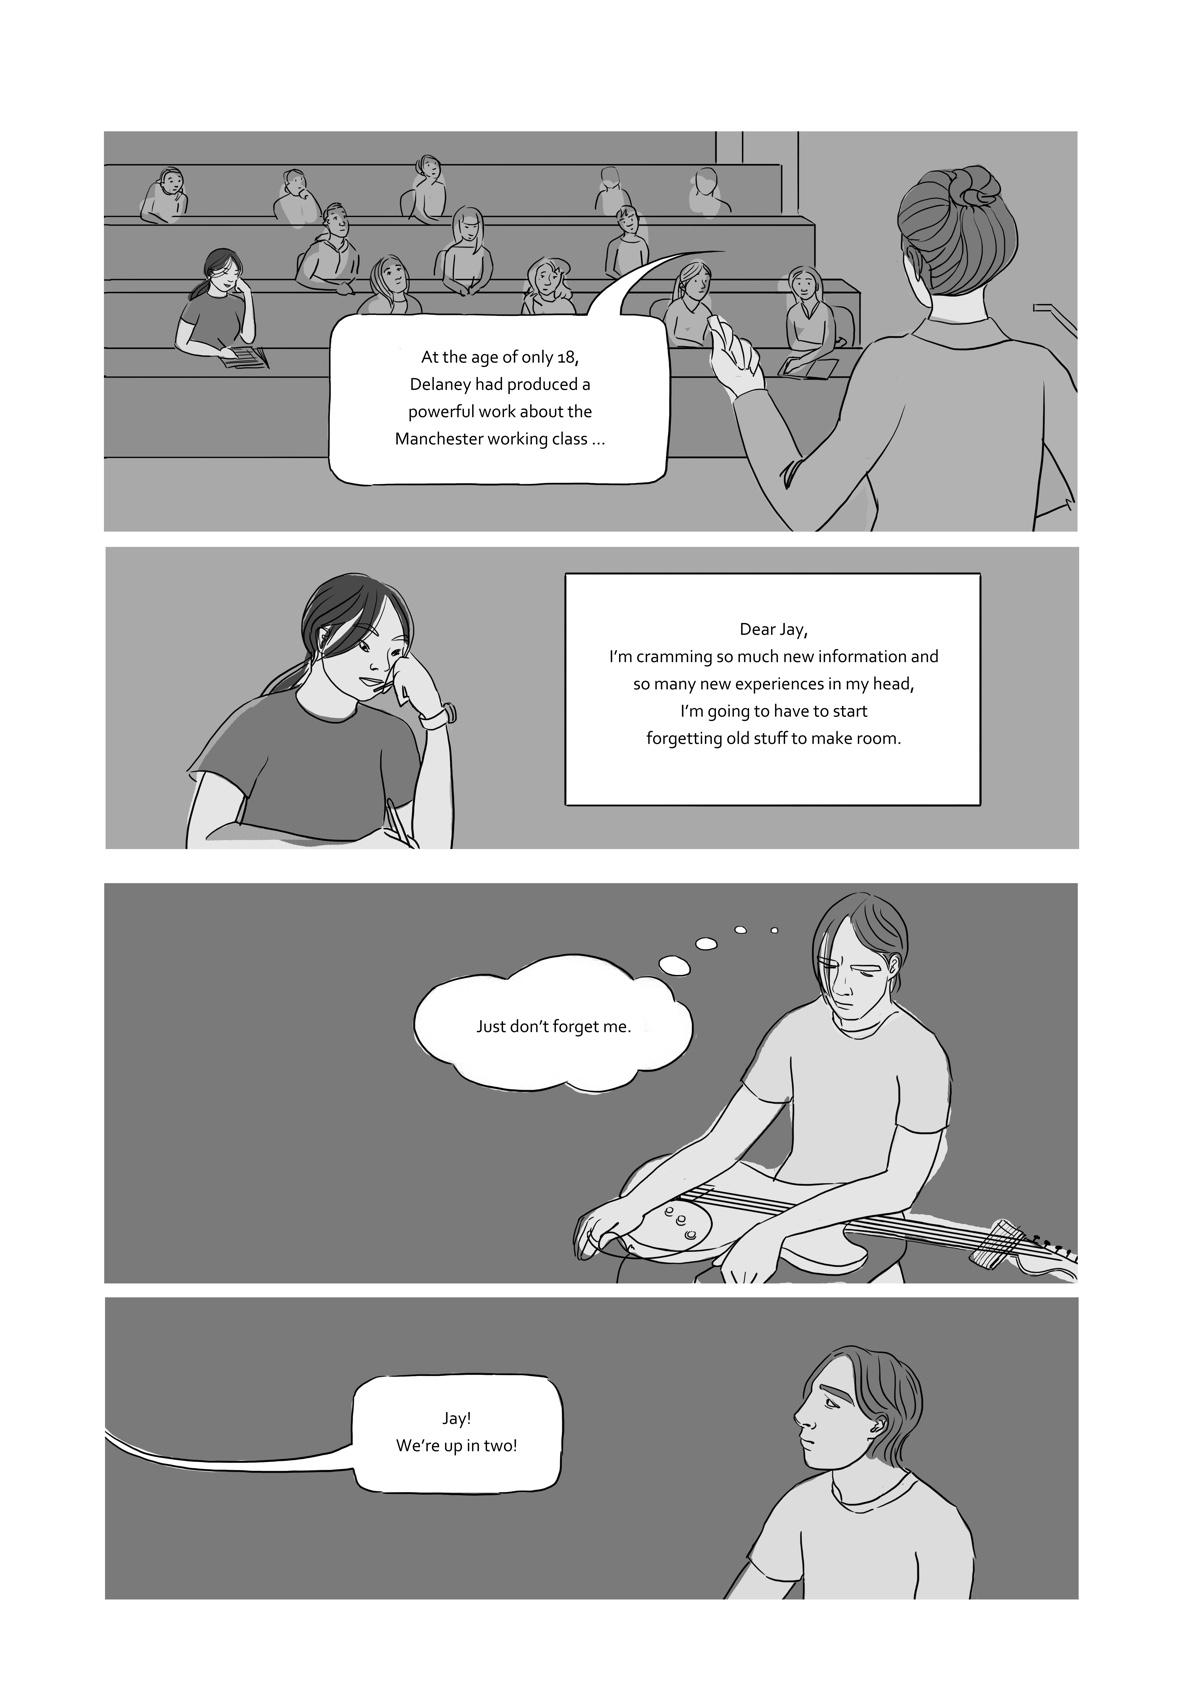 Comics-Reel-pg4.jpg